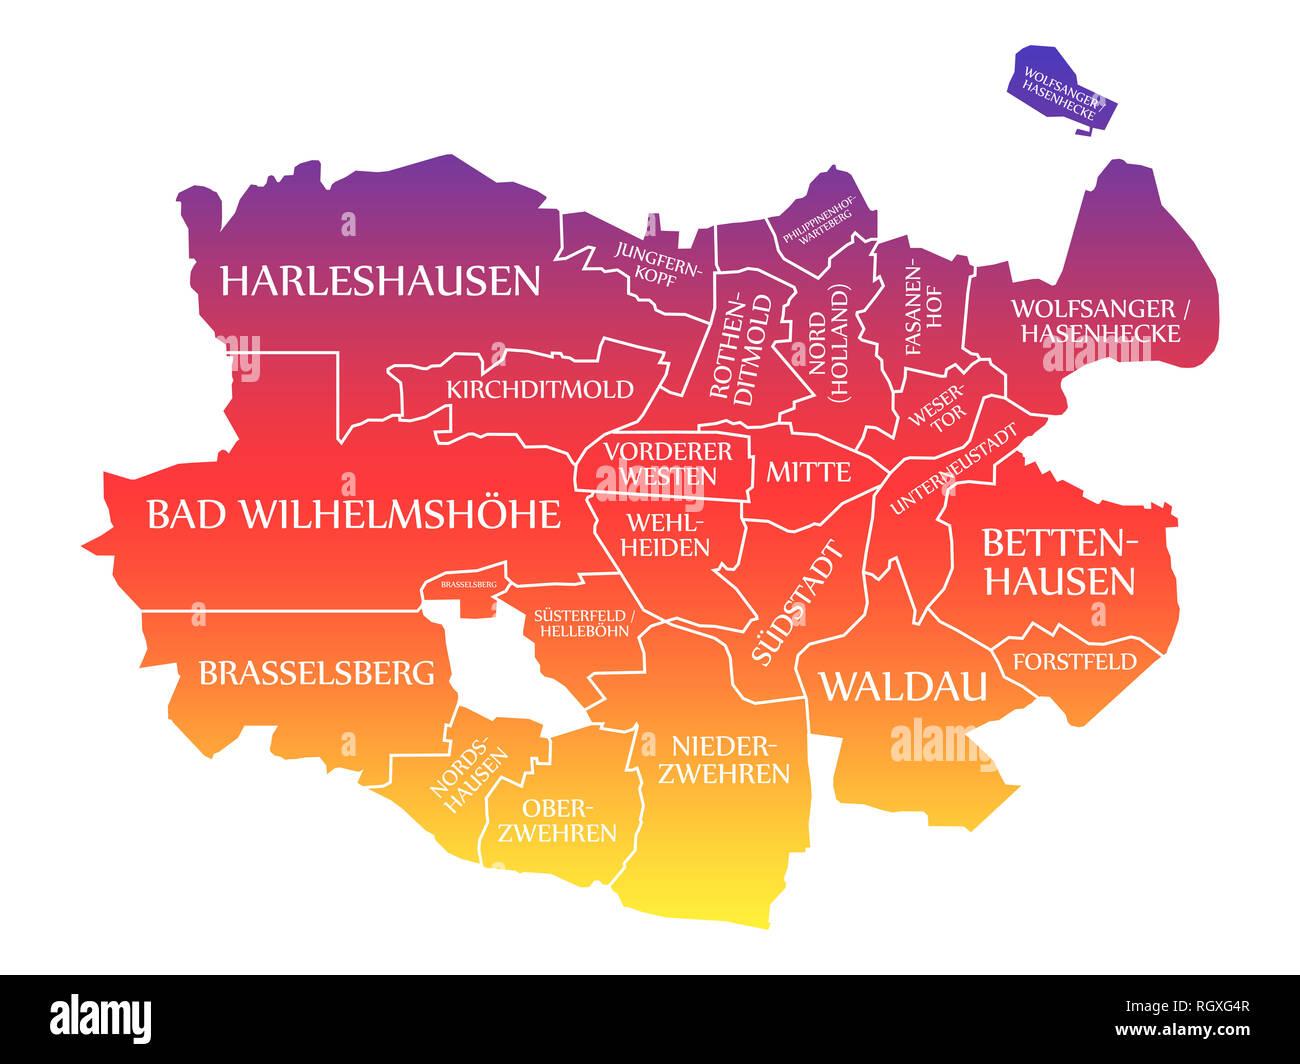 Kassel City Karte Deutschland De Beschriftet Rainbow Farbige